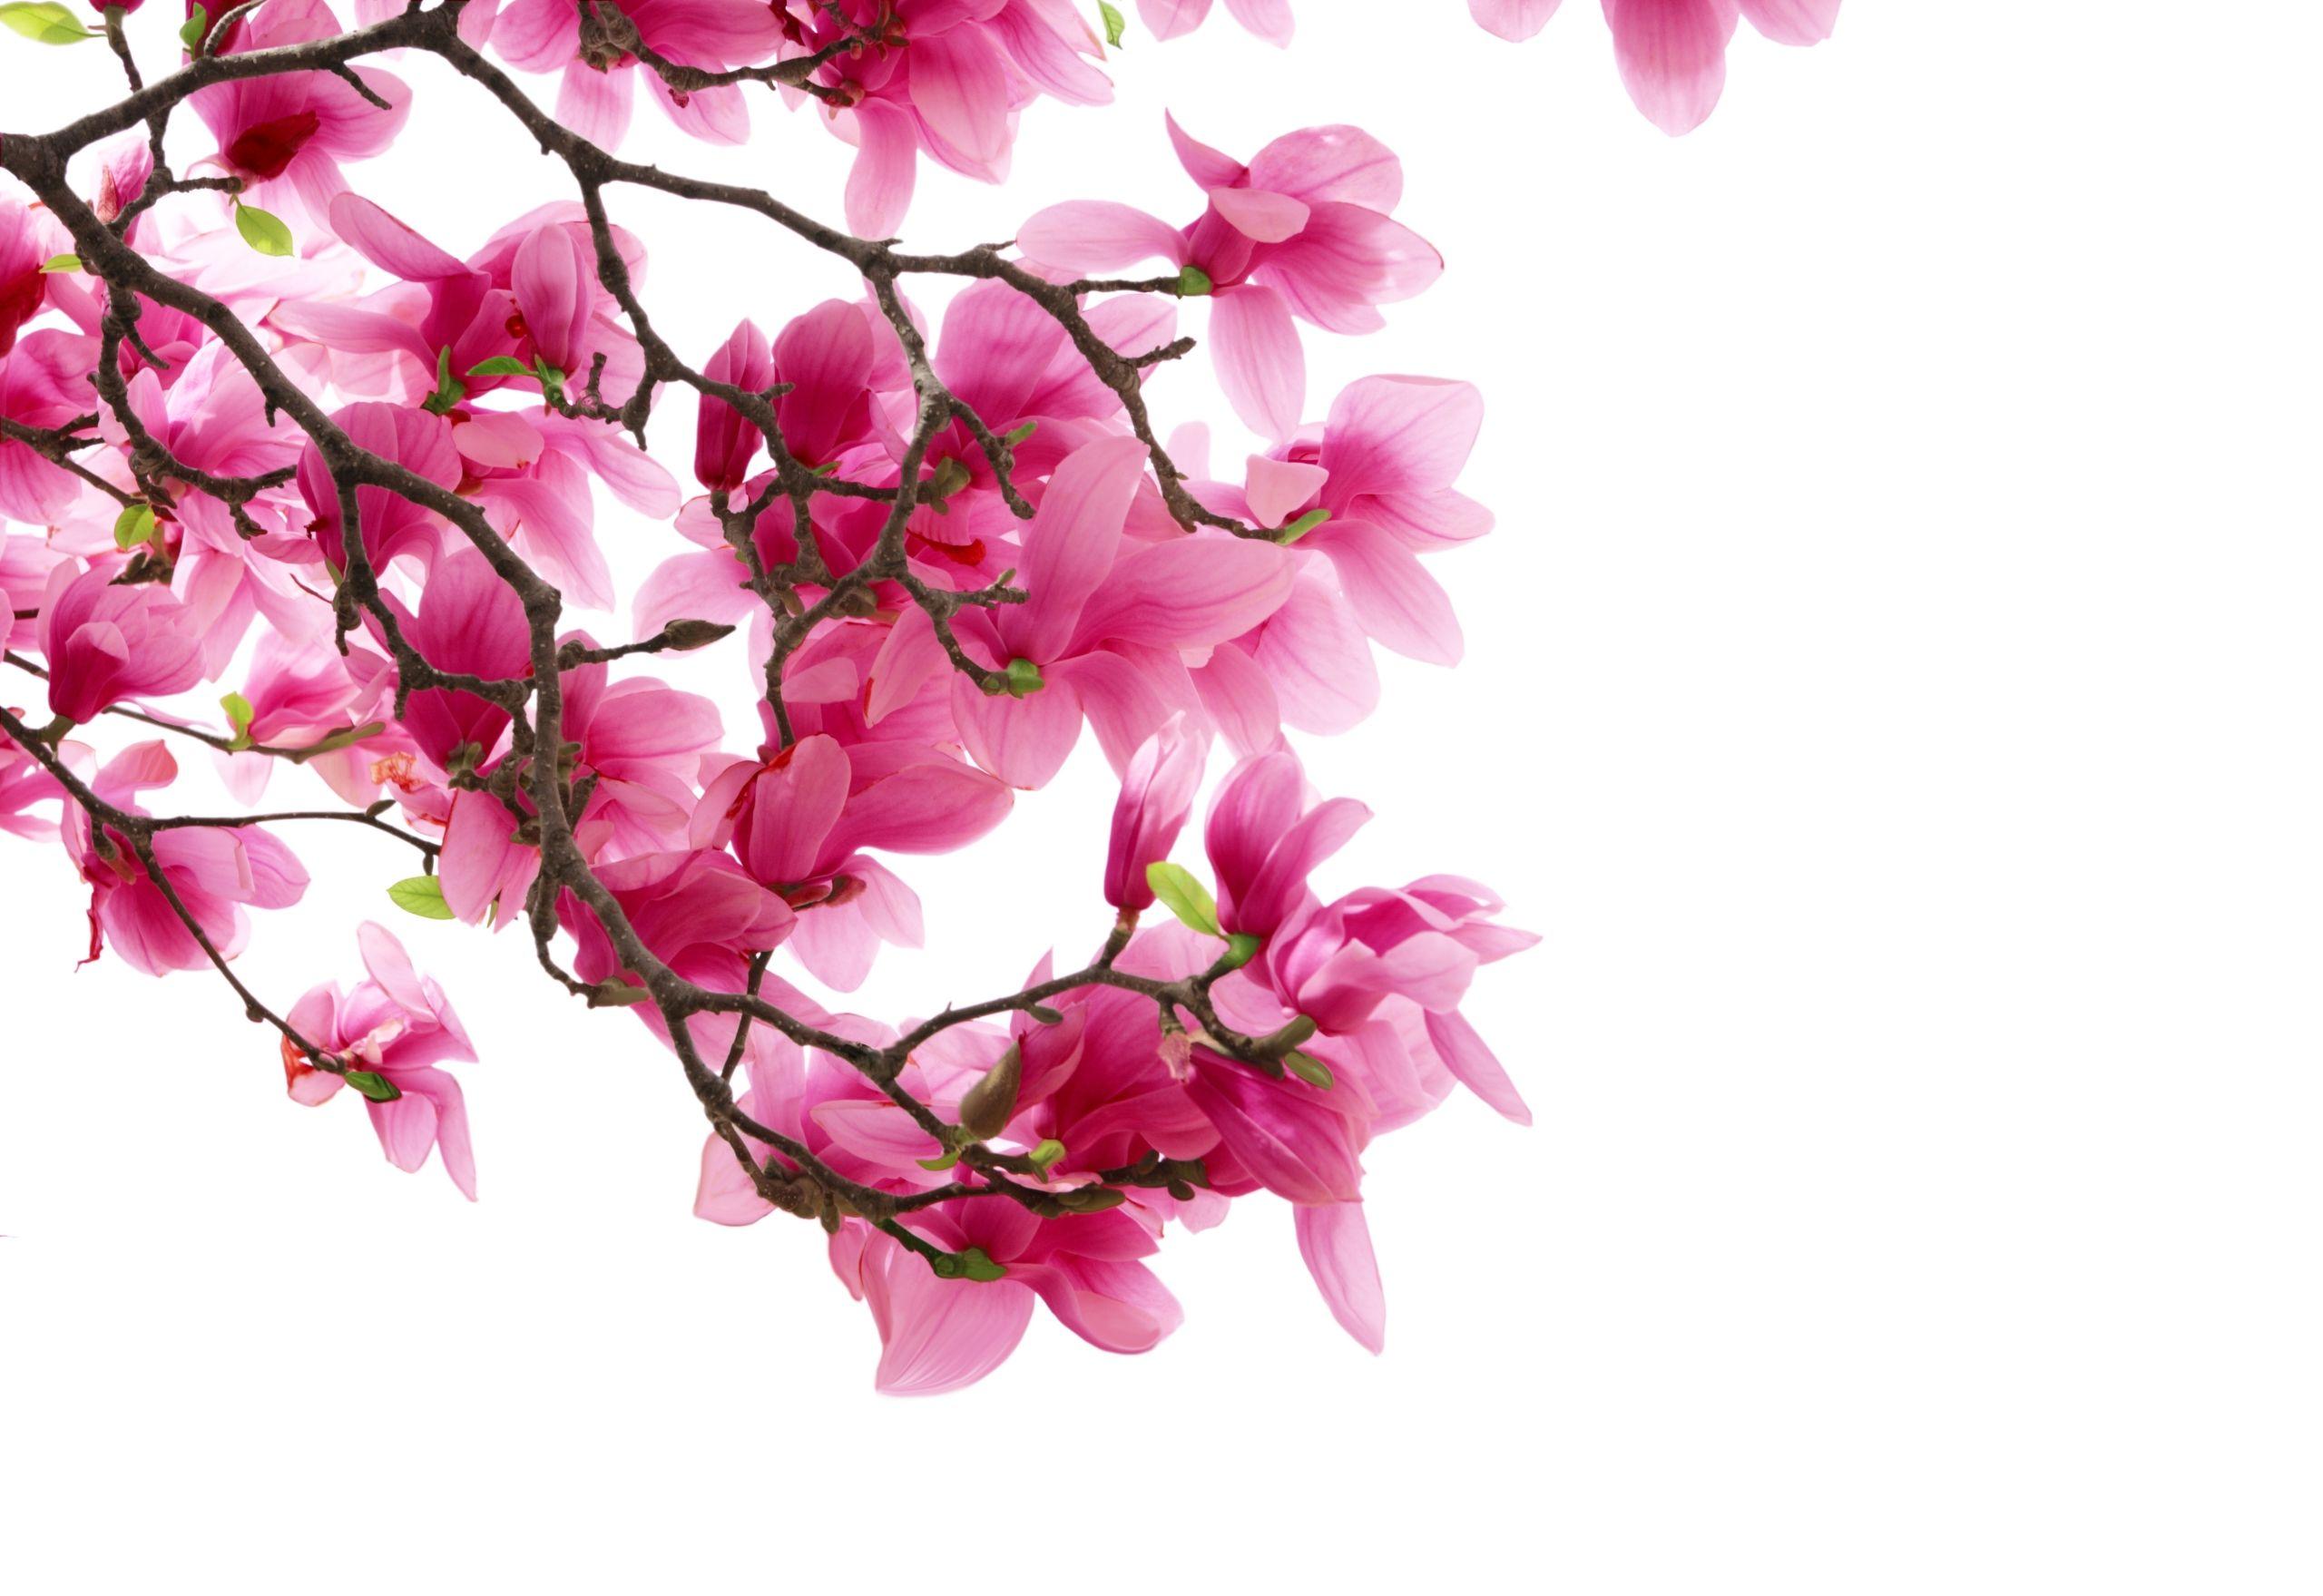 fond d 39 cran cerisiers en fleurs pinterest cran cerisier en fleur et fleurs roses. Black Bedroom Furniture Sets. Home Design Ideas